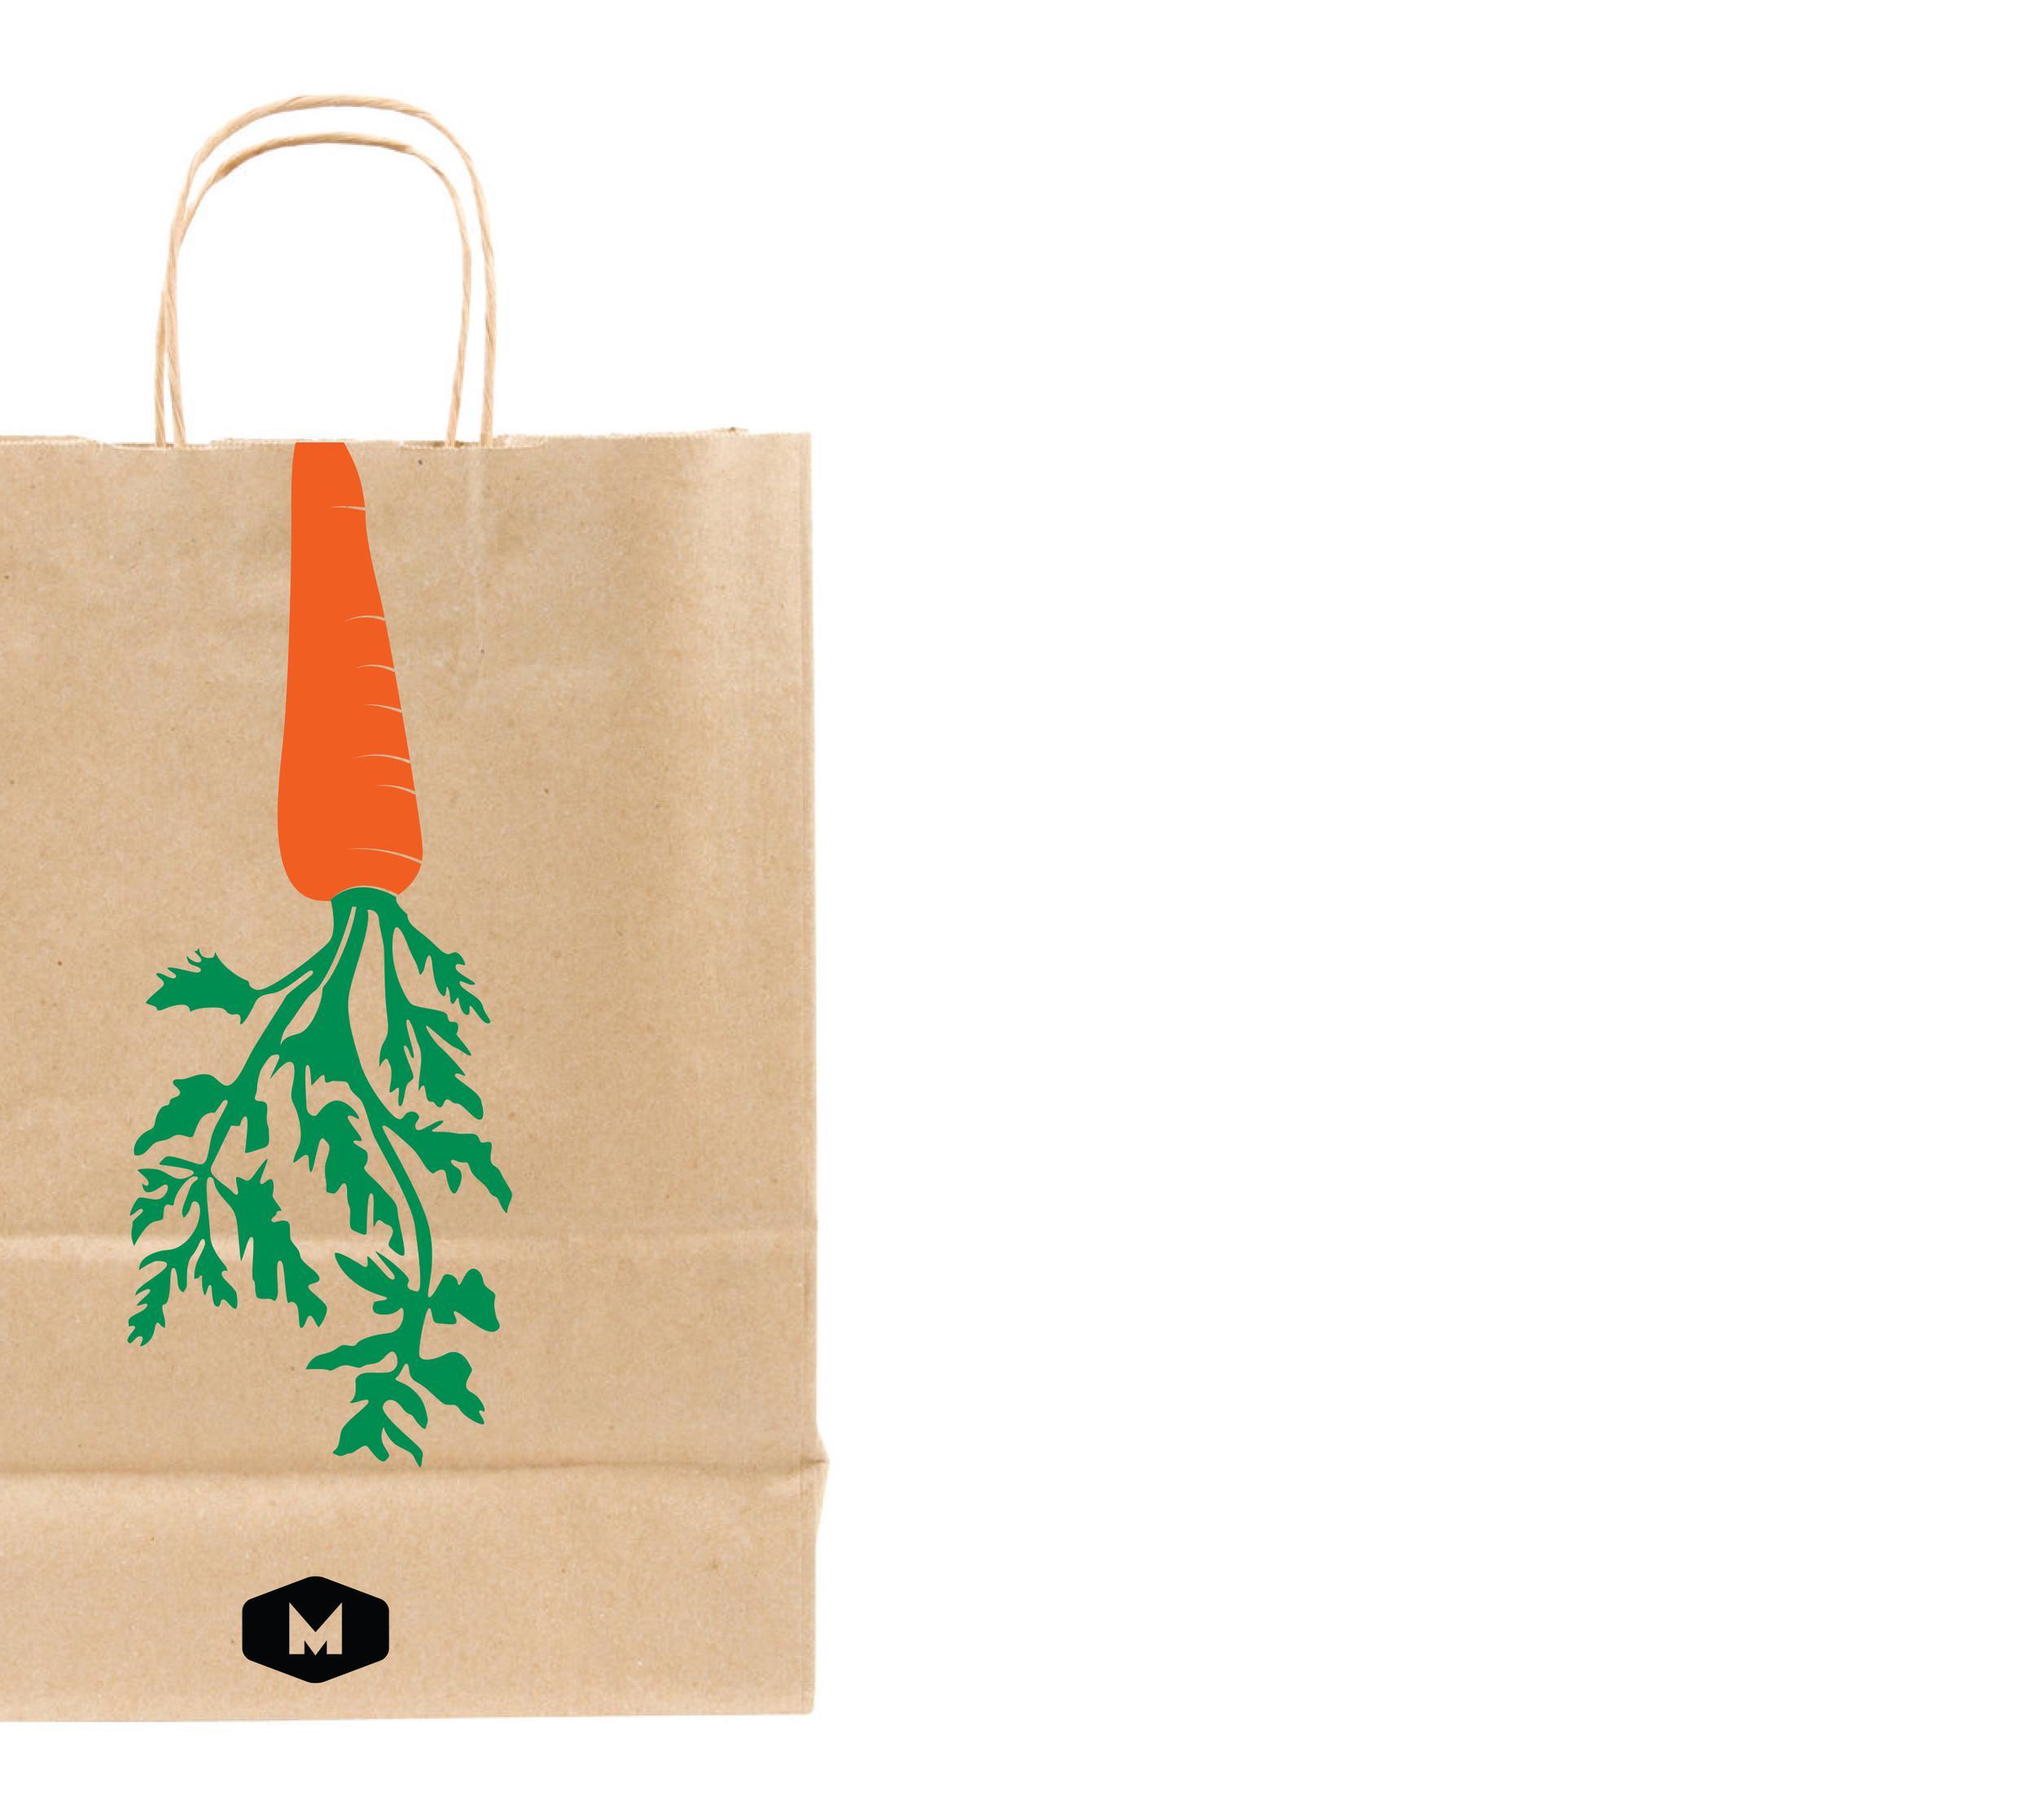 mcs_take out bags-1.jpg